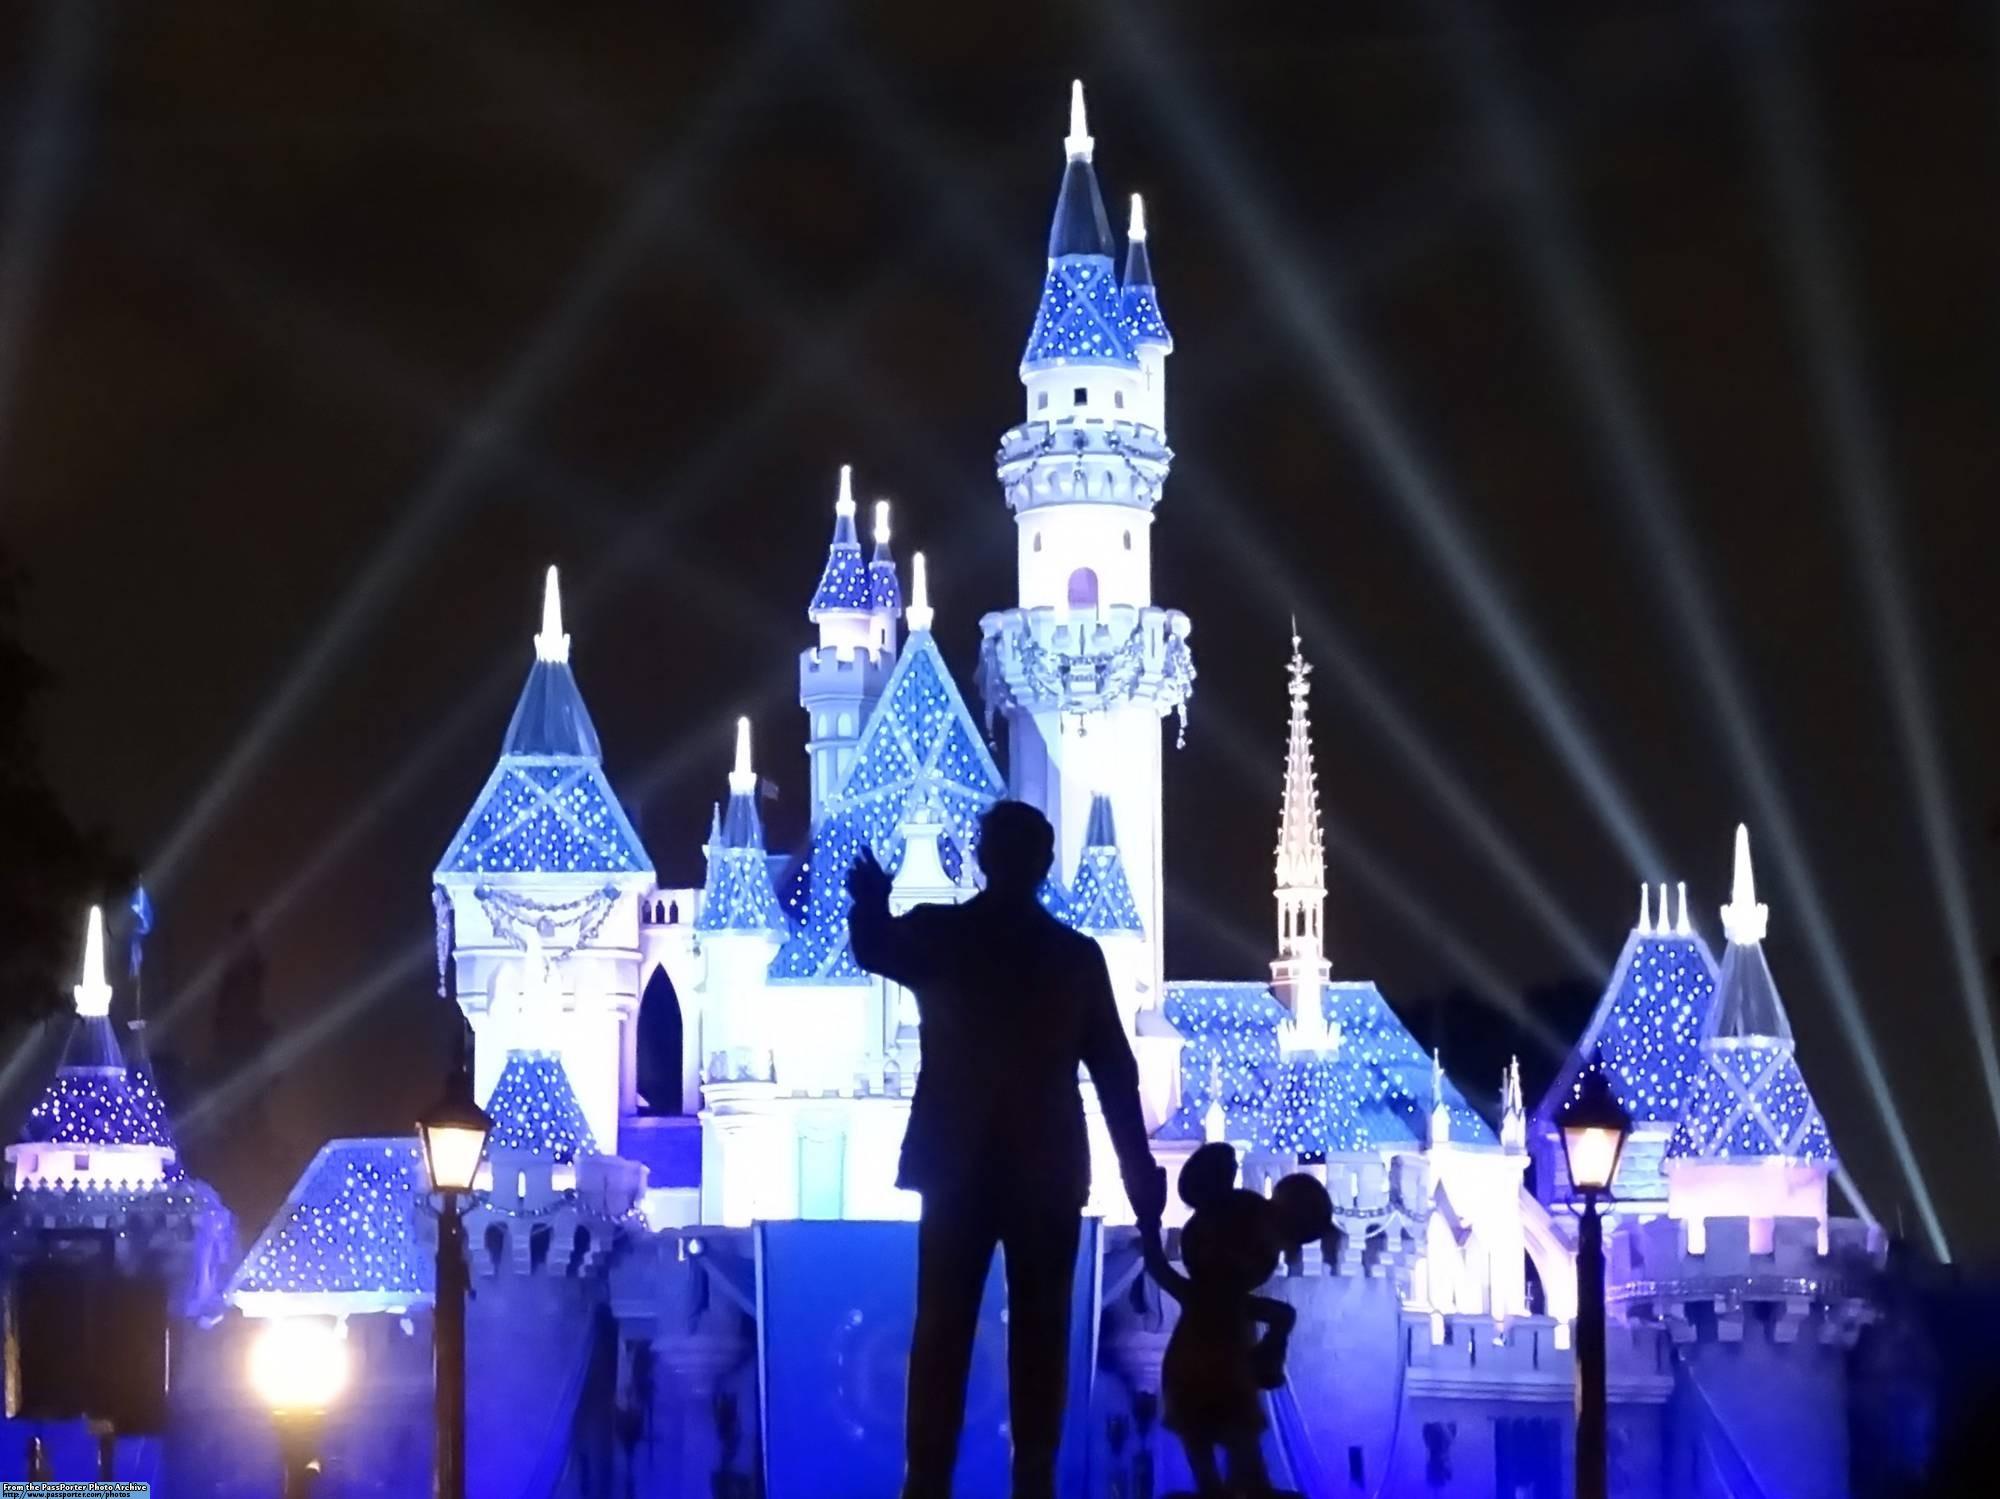 Disneyland - Sleeping Beauty Castle at night photo